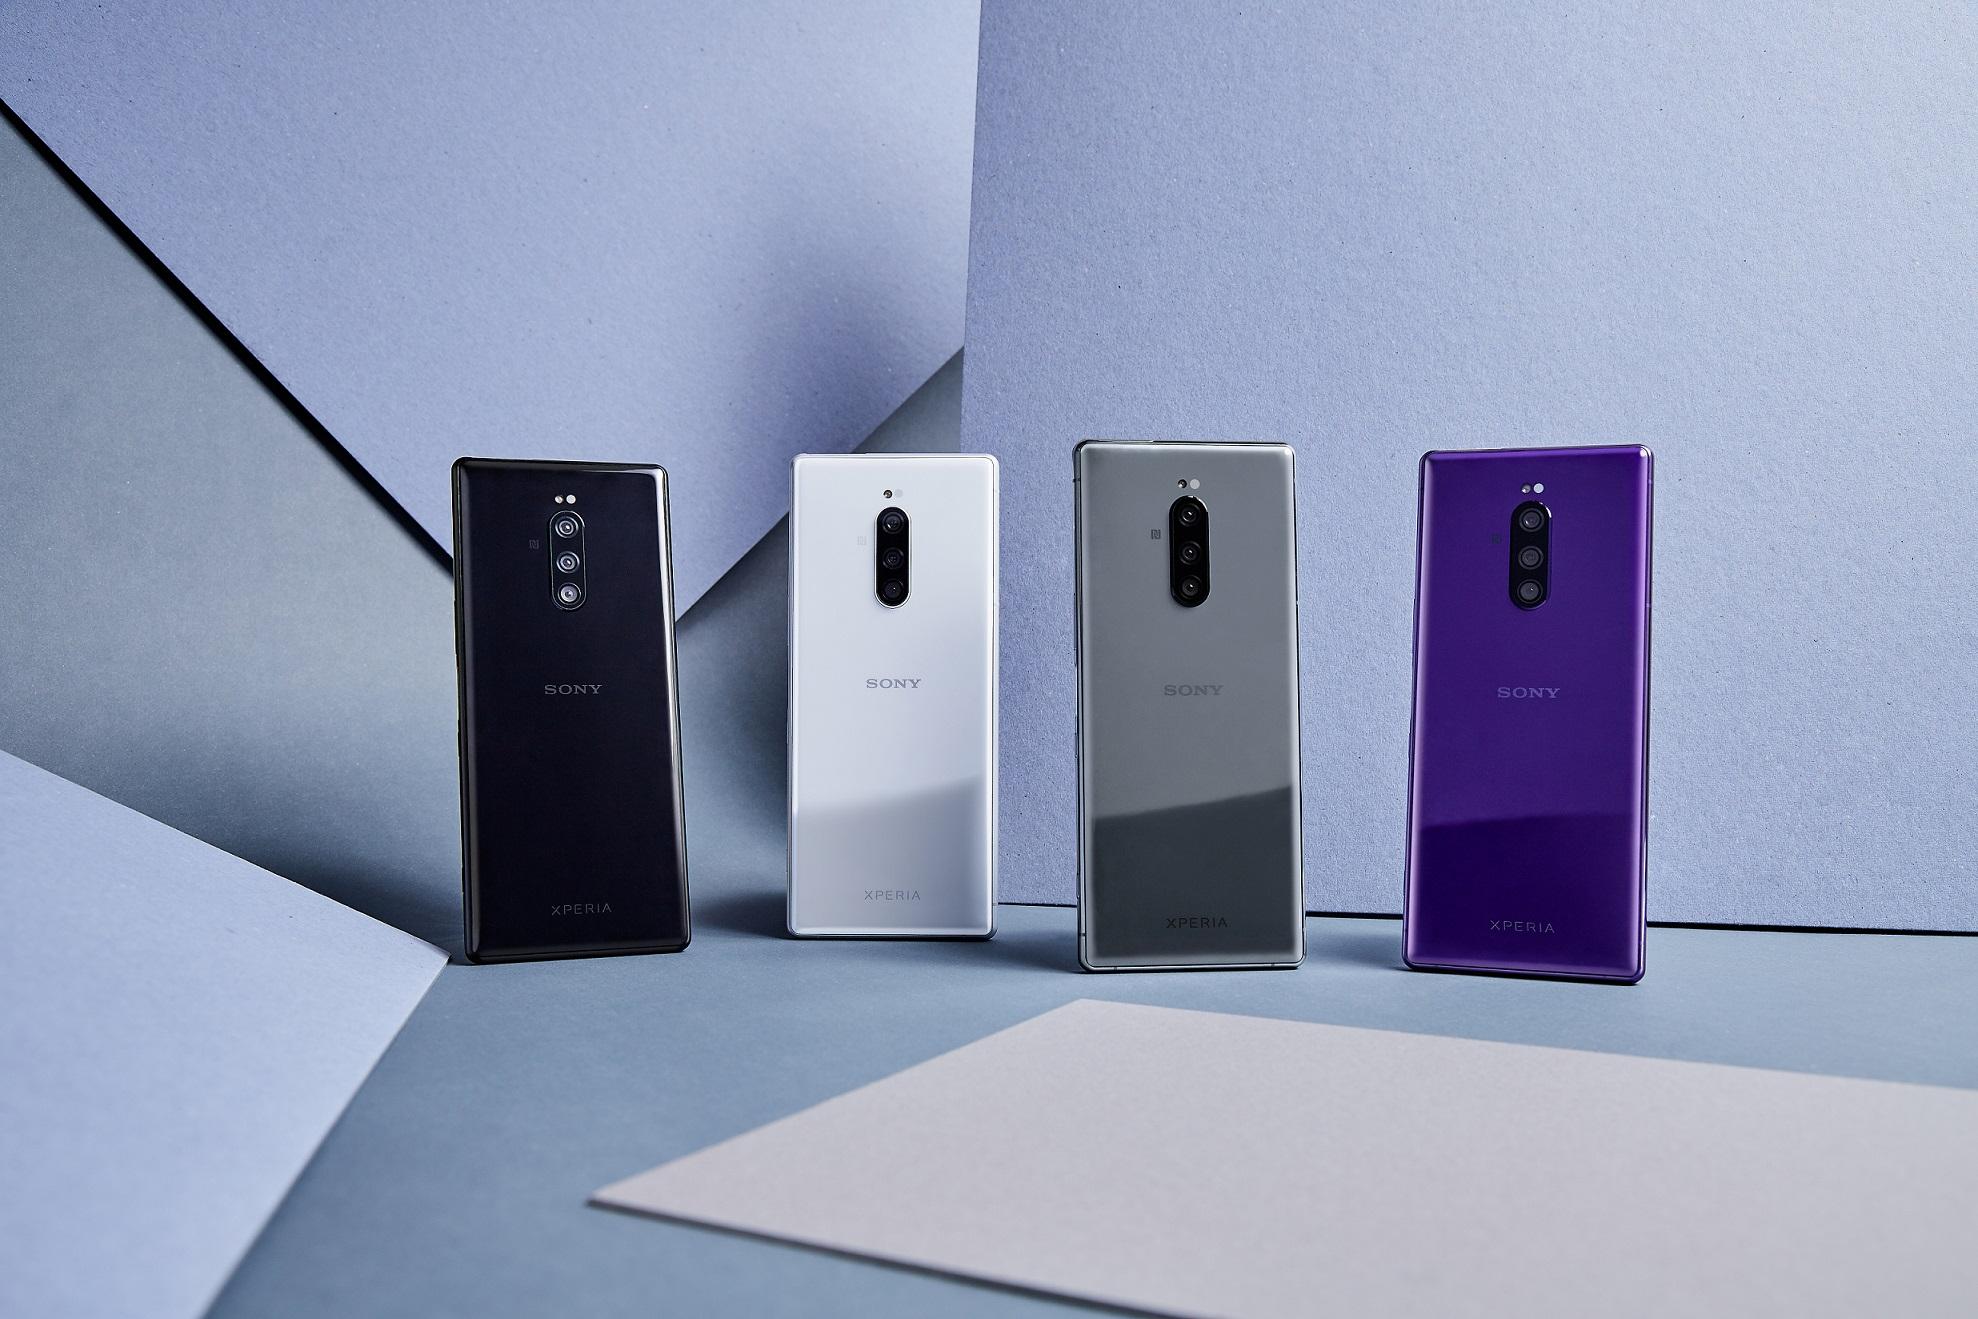 Xperia 1屢獲國際大獎肯定,榮獲Red Dot Award 2020與IF Design Award設計獎項